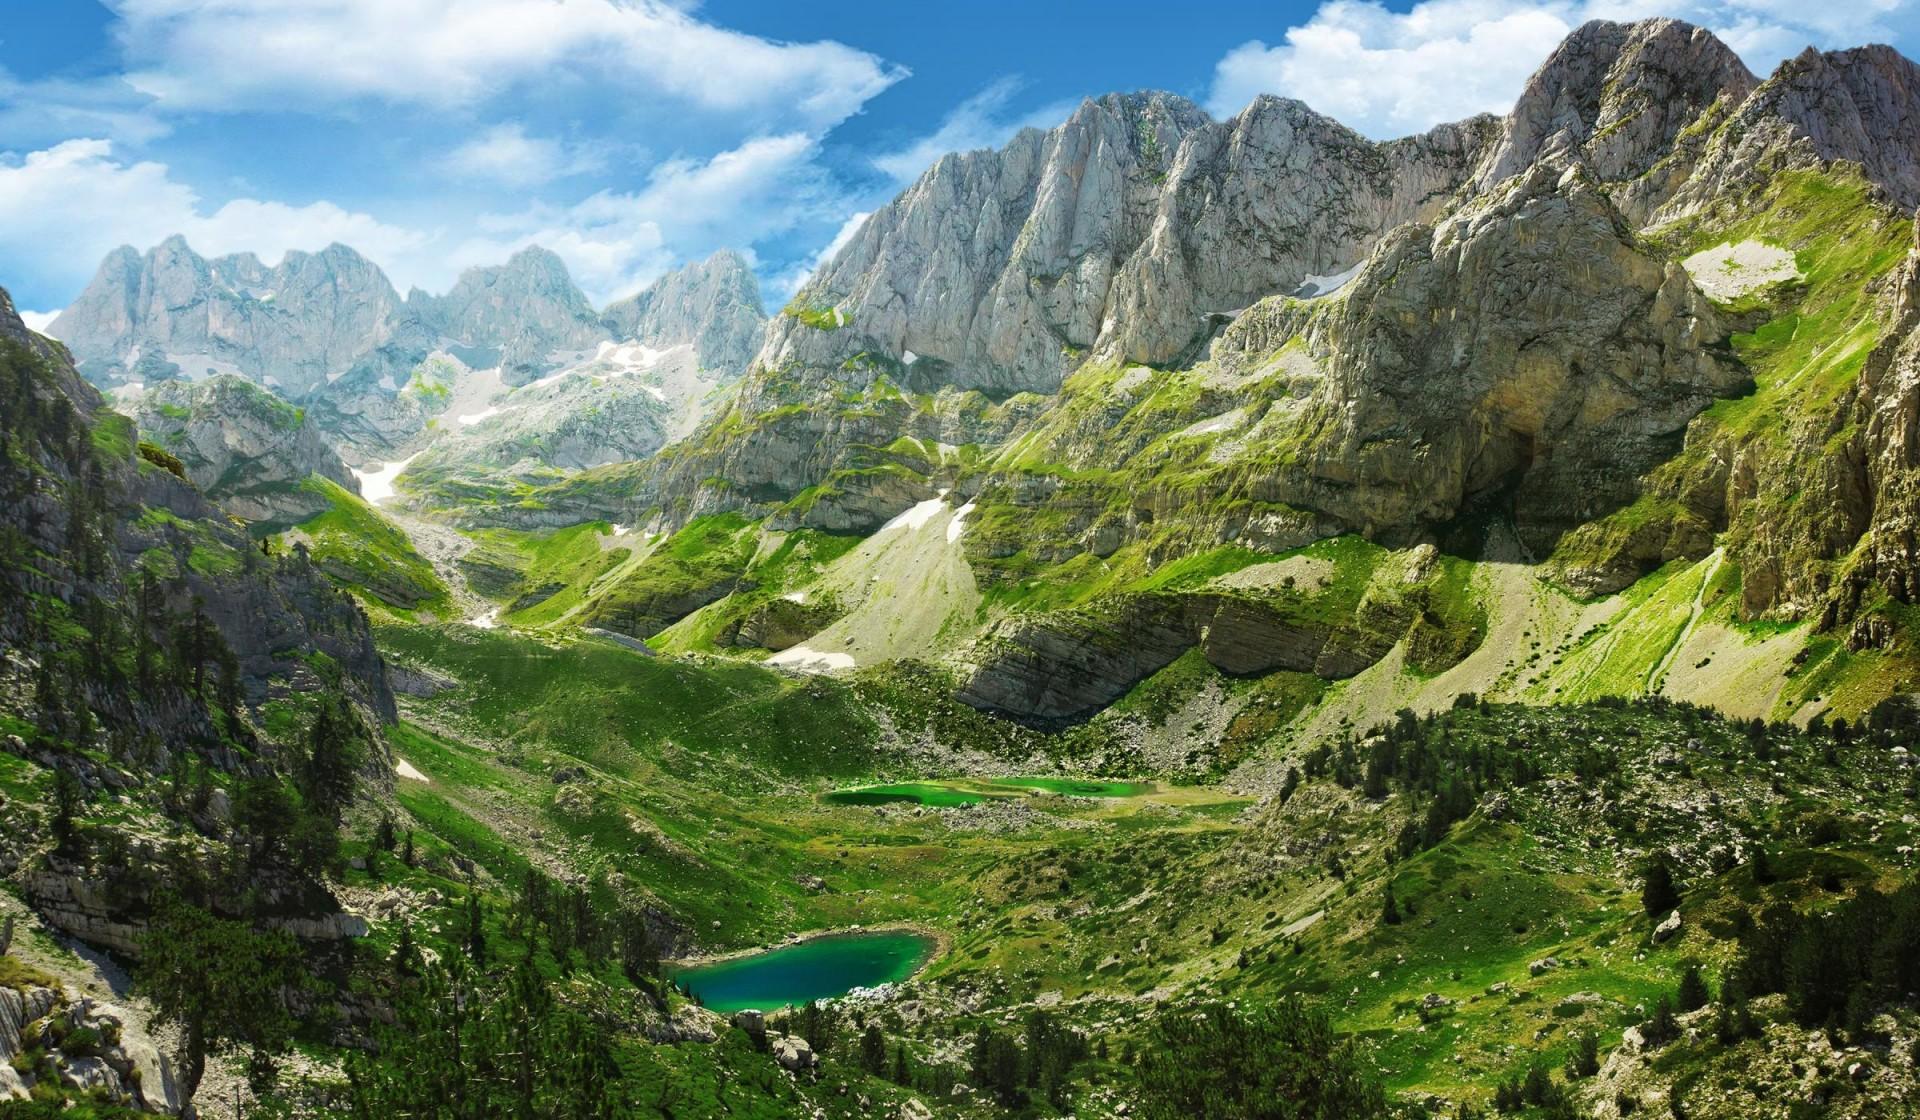 008 Tourism In Albania Essay Example Cx0gqd6f5810e5207ff9d 2400 1400 C 75 Unbelievable 1920